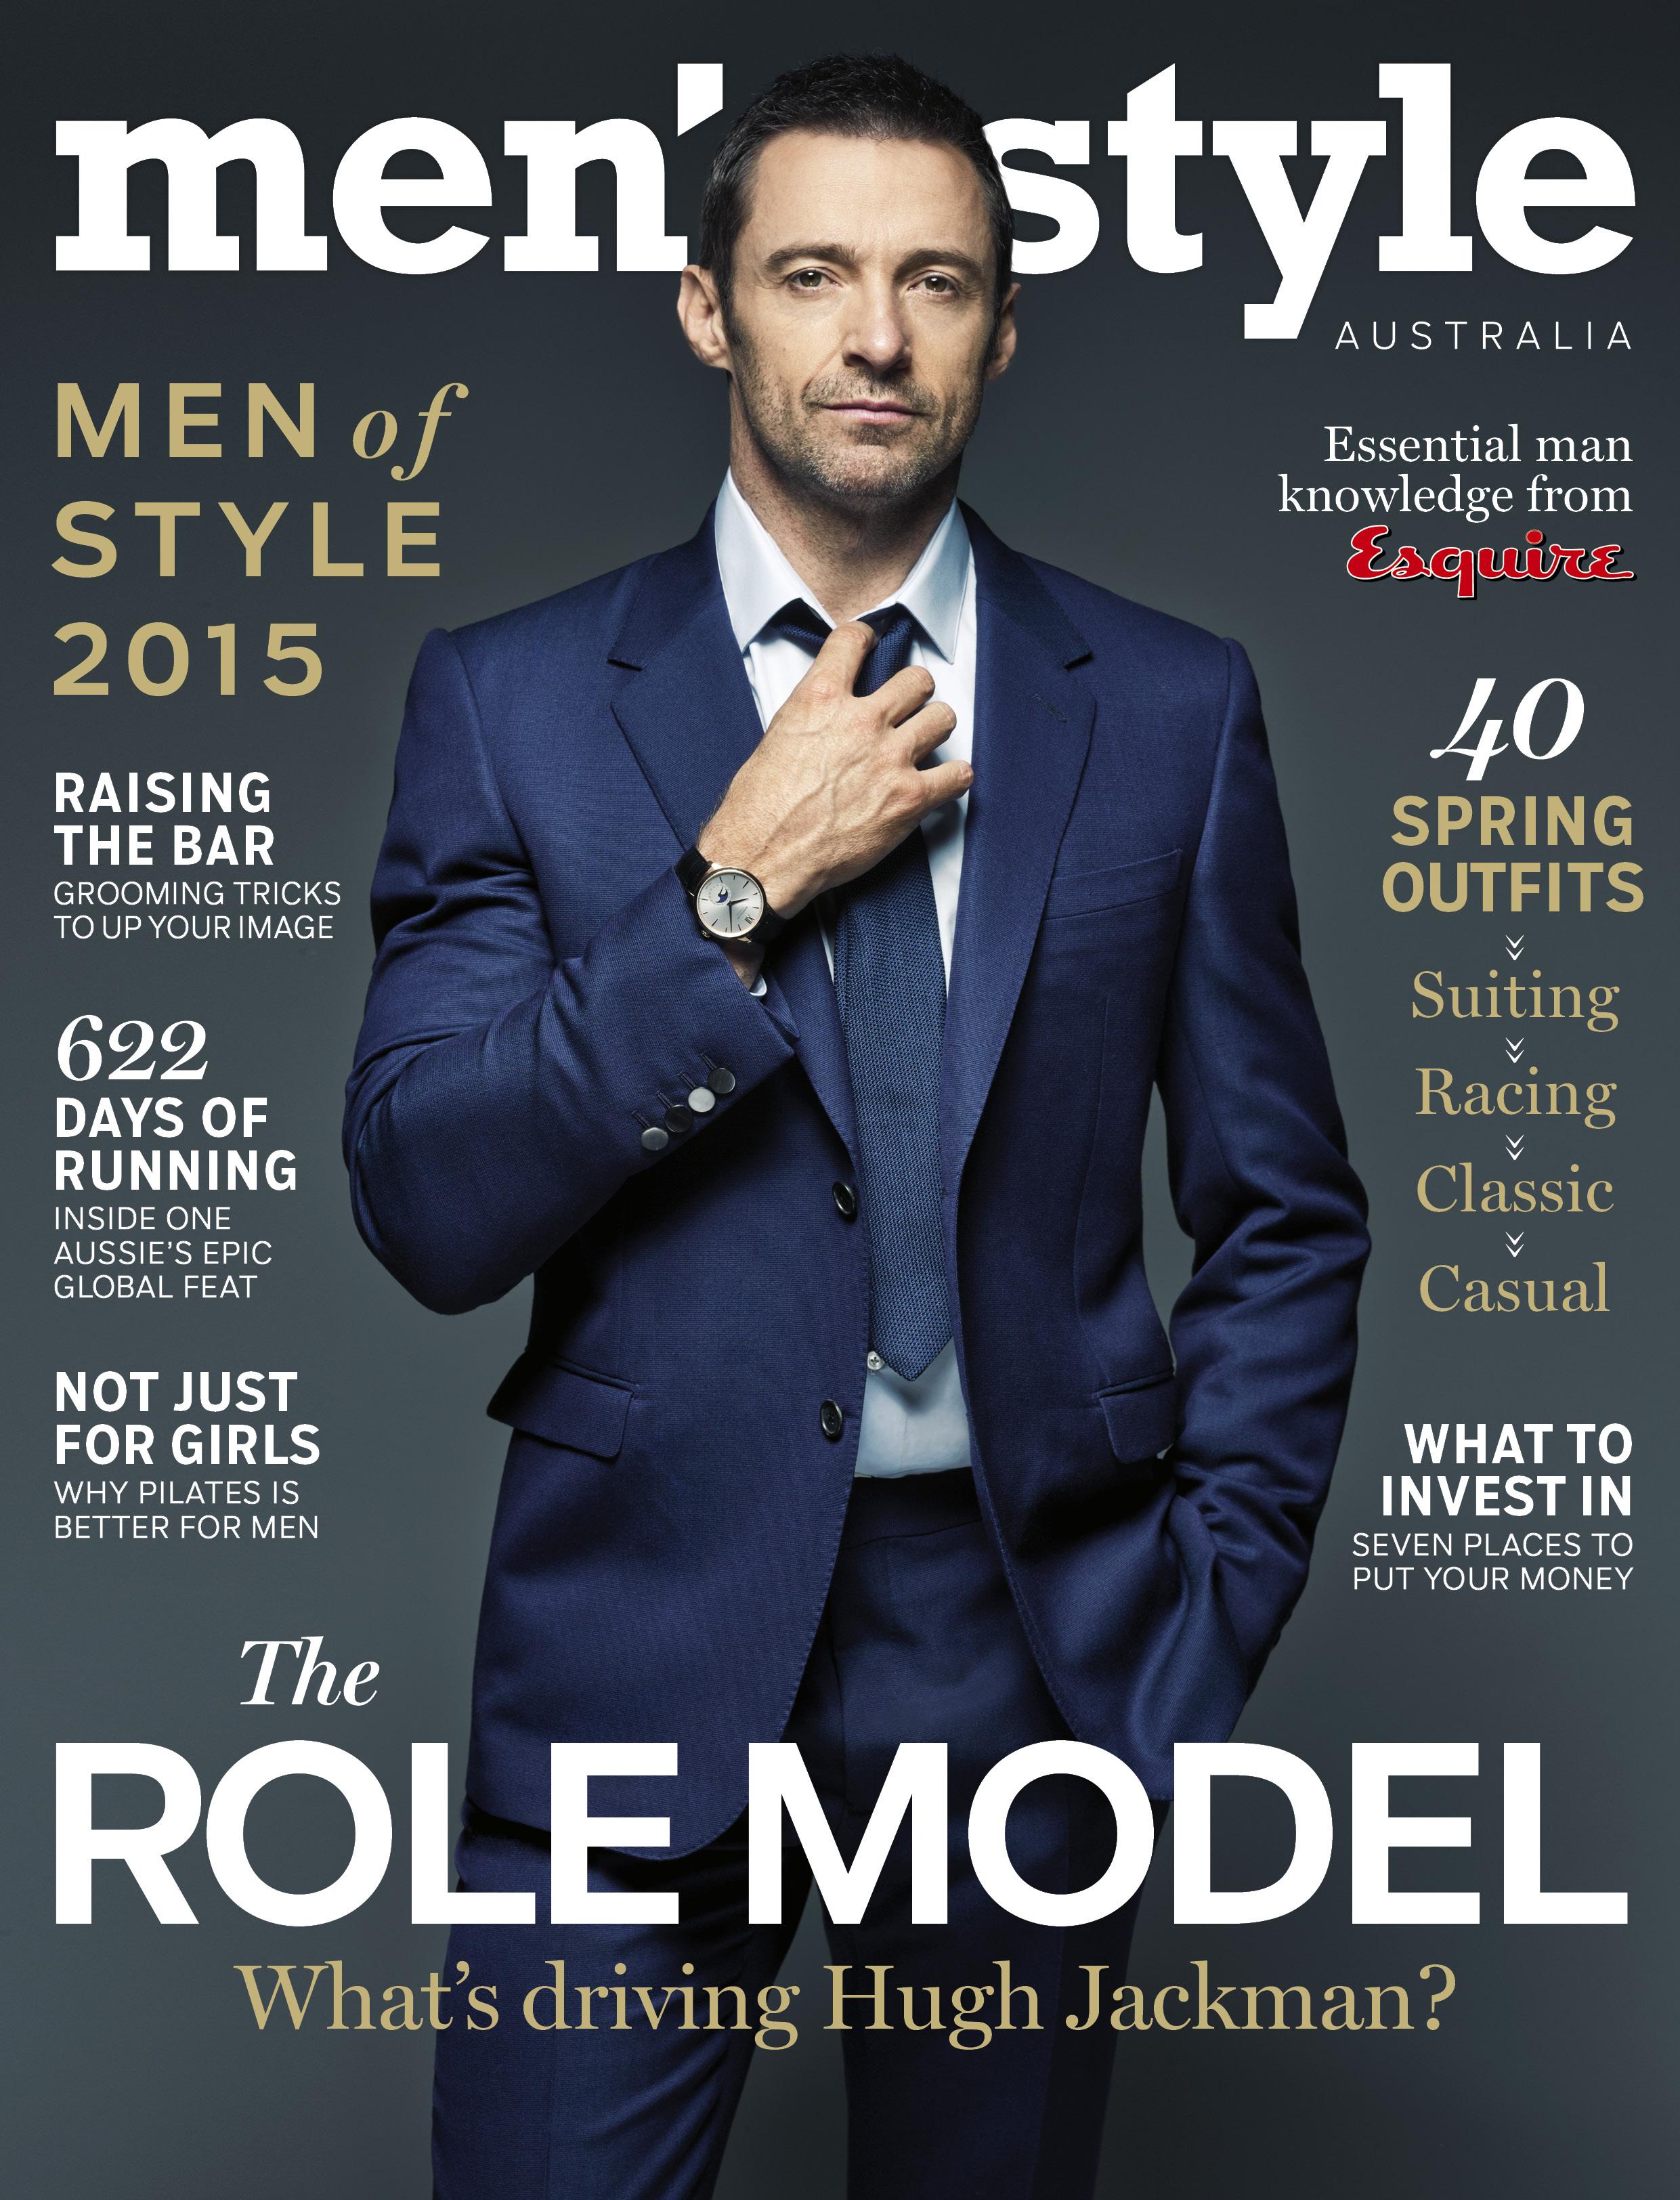 men u0026 39 s style annual  u0026 39 men of style u0026 39  list announced